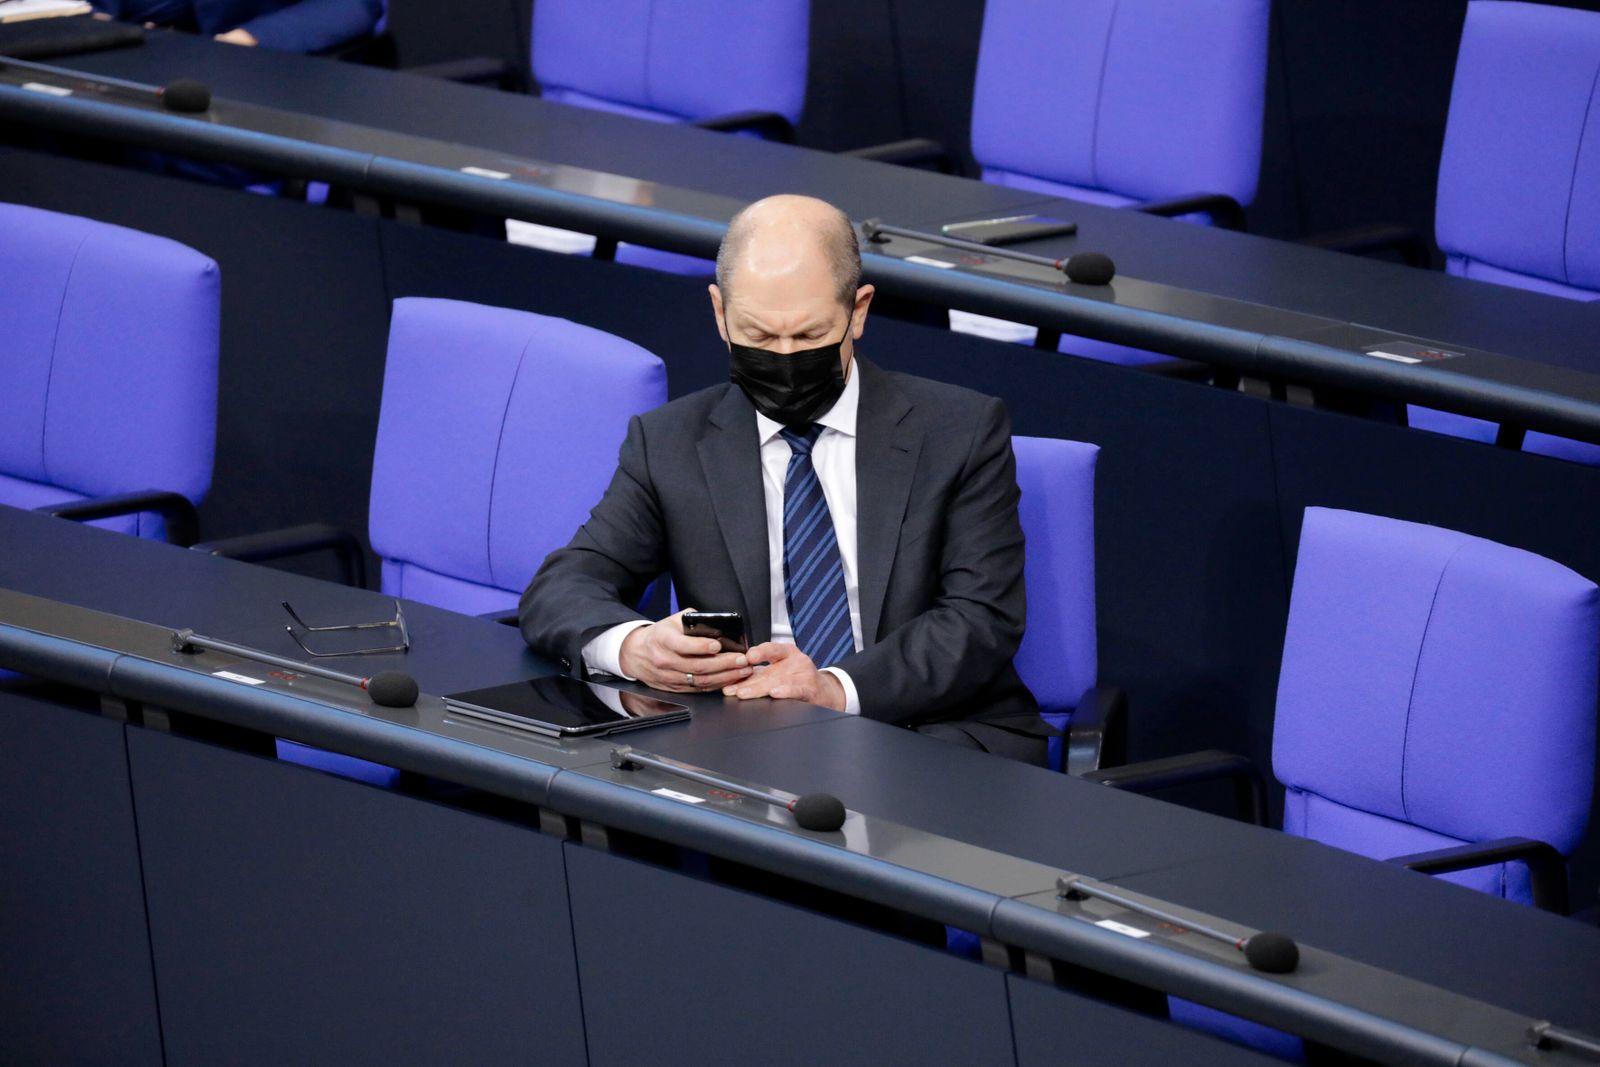 Olaf Scholz, Bundesminister der Finanzen, SPD, 203. Bundestagssitzung, DEU, Berlin, 13.01.2021 *** Olaf Scholz, Federal